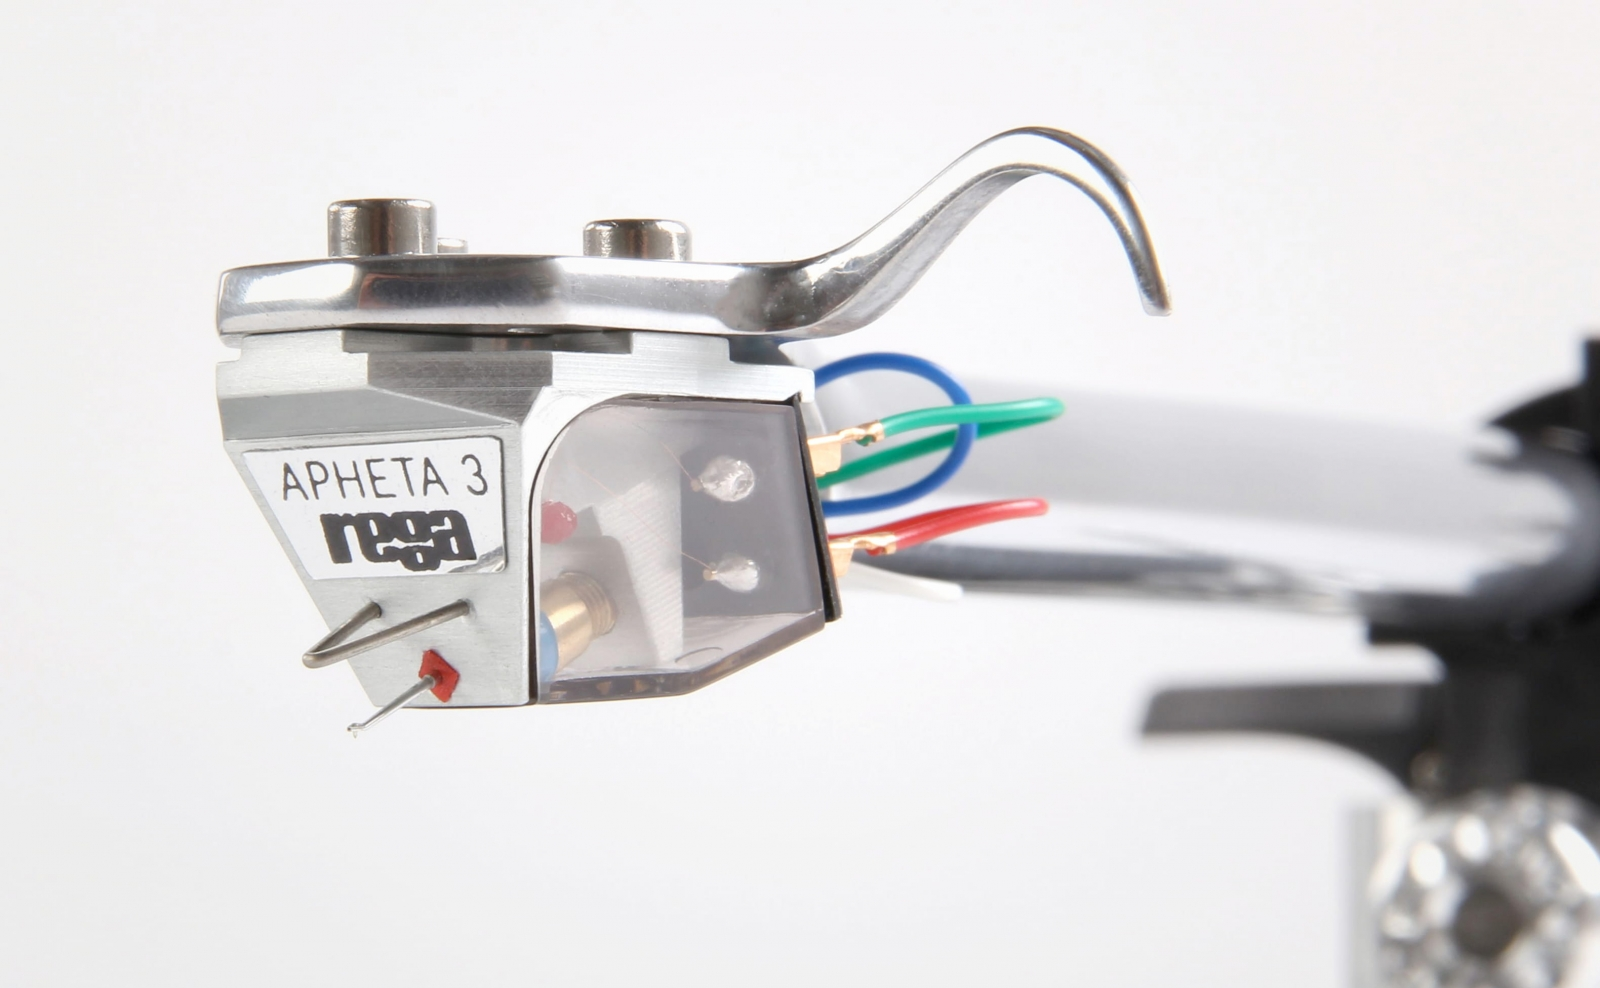 Rega Alpheta 3 moving coil cartridge for Rega turntables